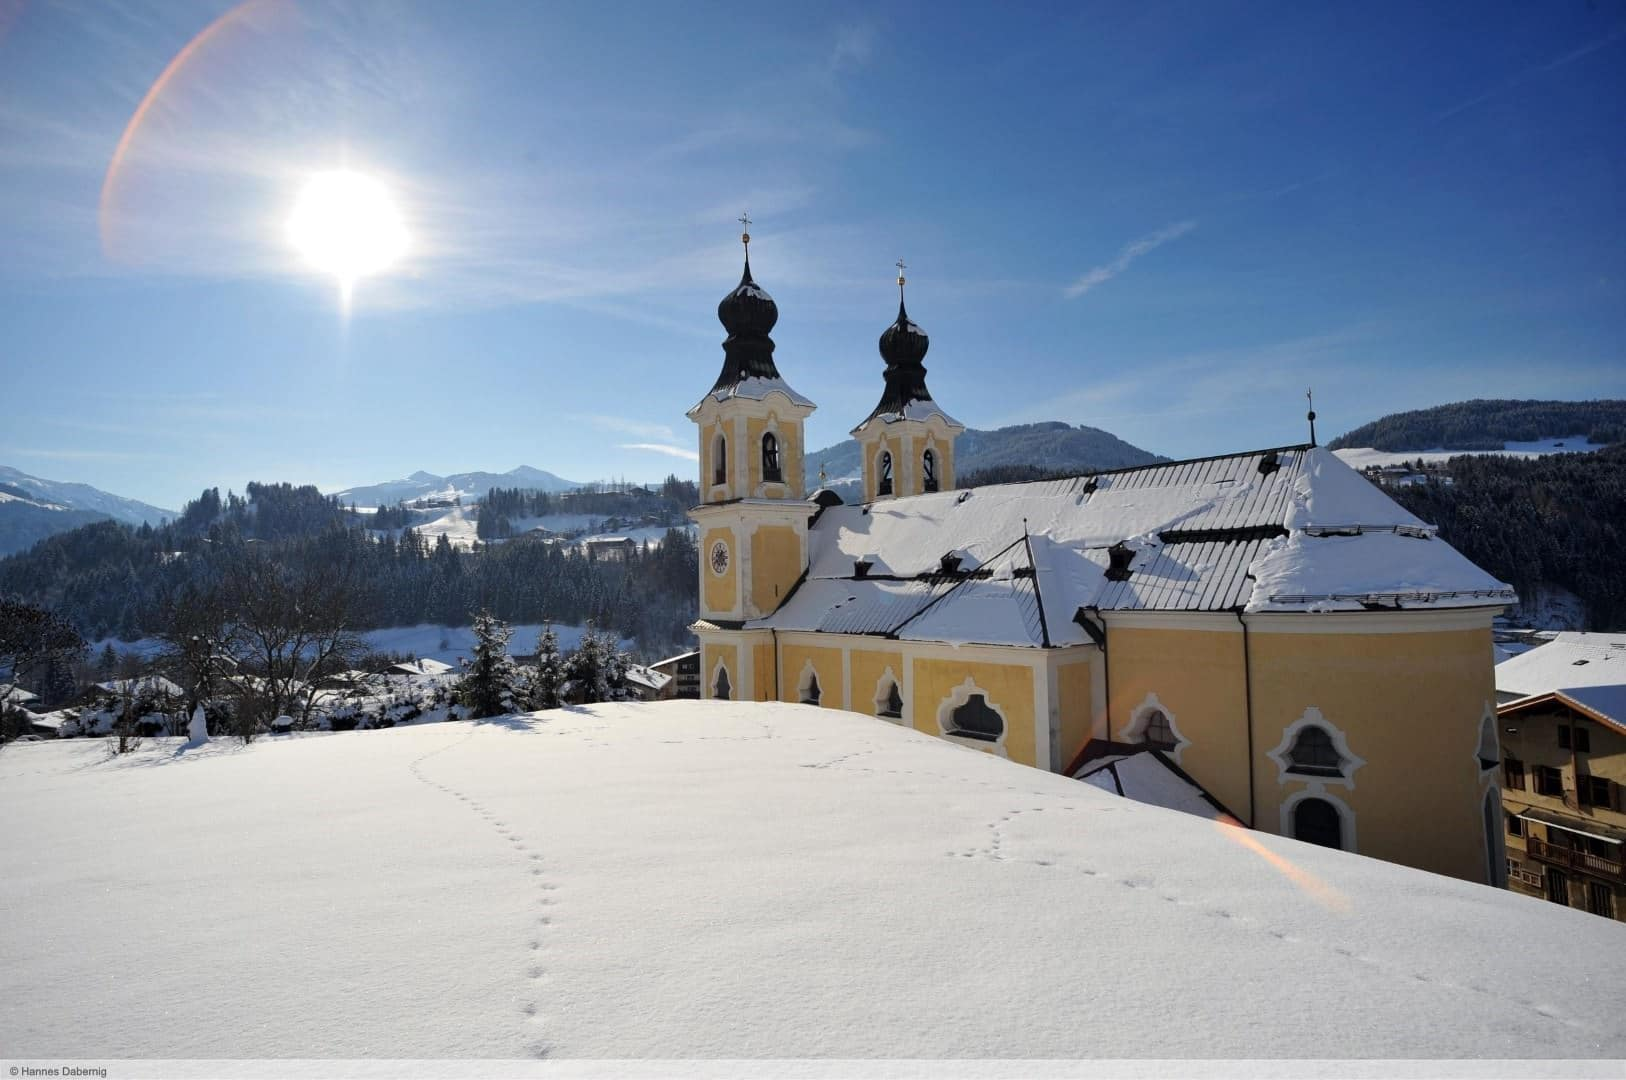 wintersport en aanbiedingen in Hopfgarten